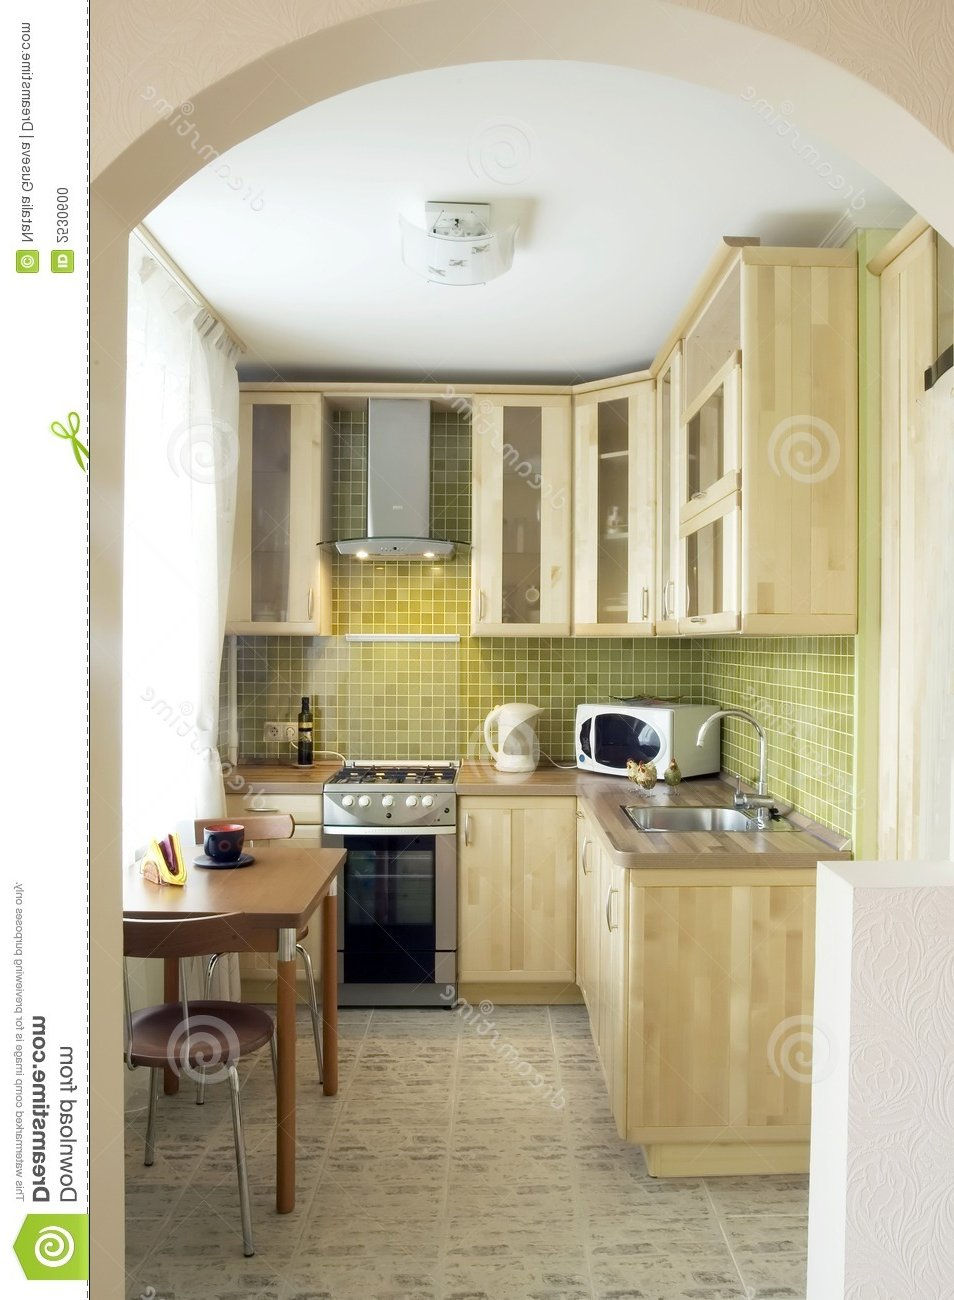 Идеи ремонт на кухне своими руками